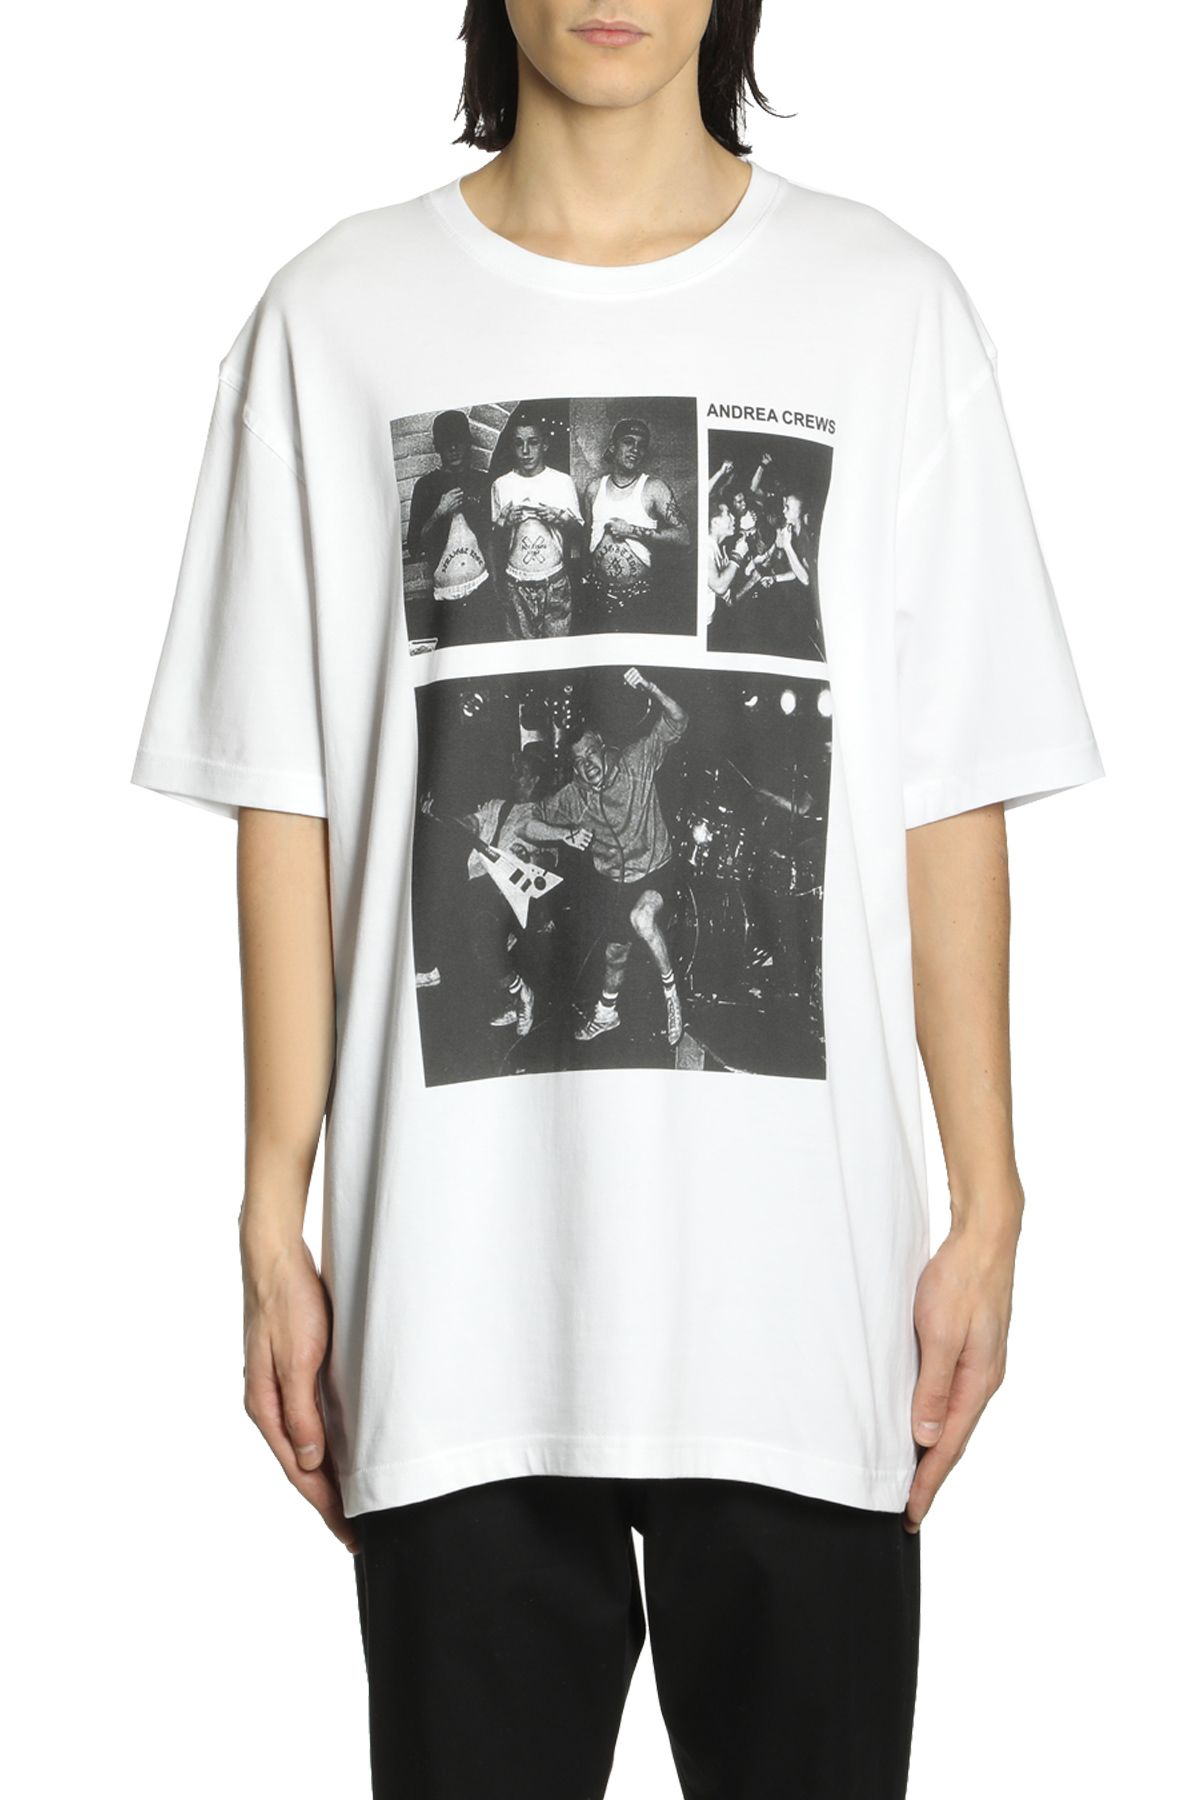 TOPWEAR - T-shirts Andrea Crews Buy Cheap 100% Original crv4cD28OU